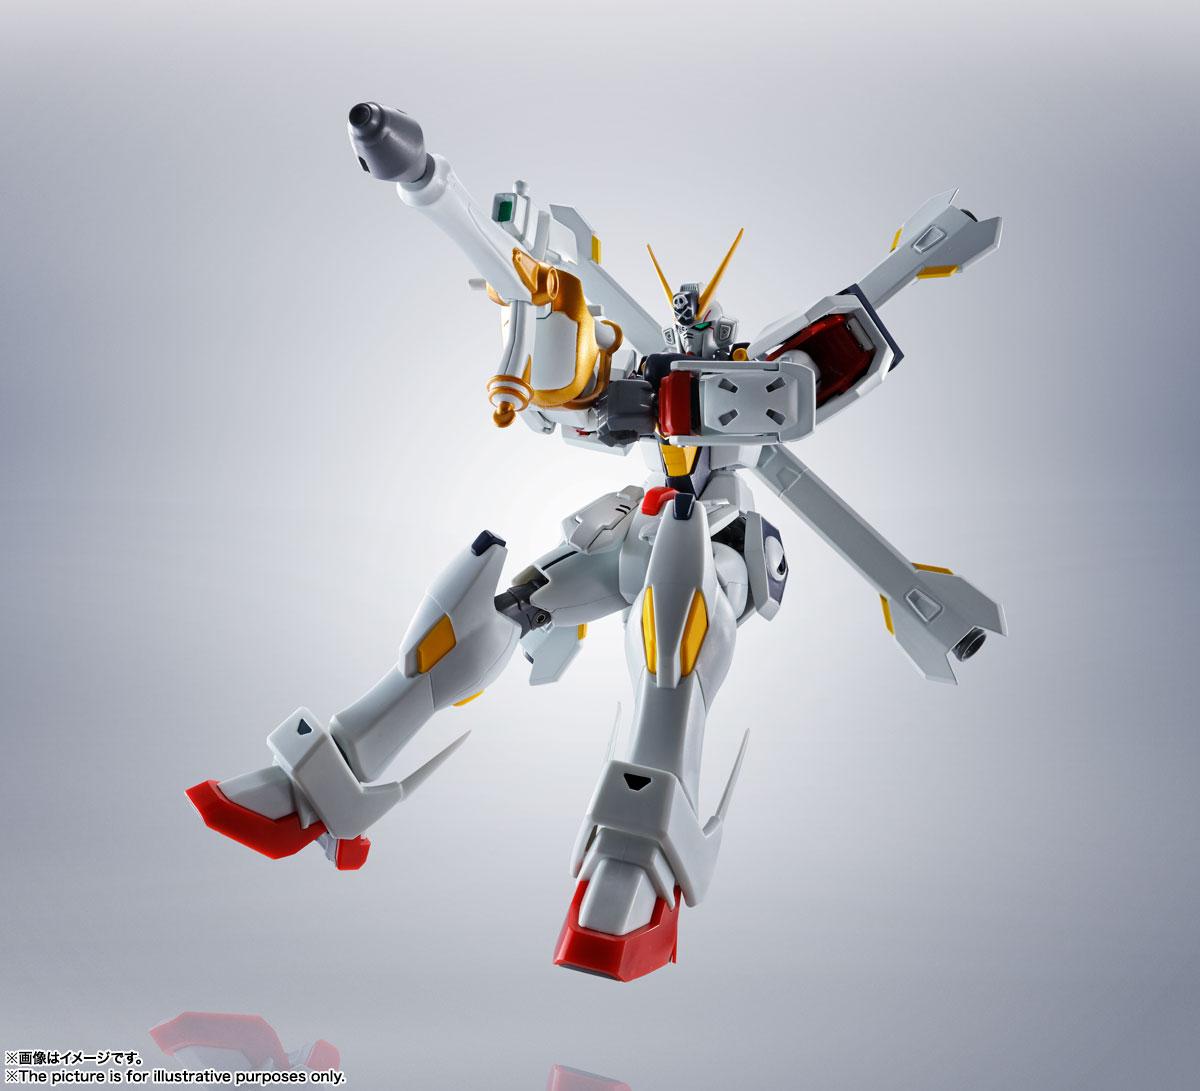 ROBOT魂〈SIDE MS〉『ガンダムX1/X1改 EVOLUTION-SPEC』クロスボーン・ガンダム 可動フィギュア-006